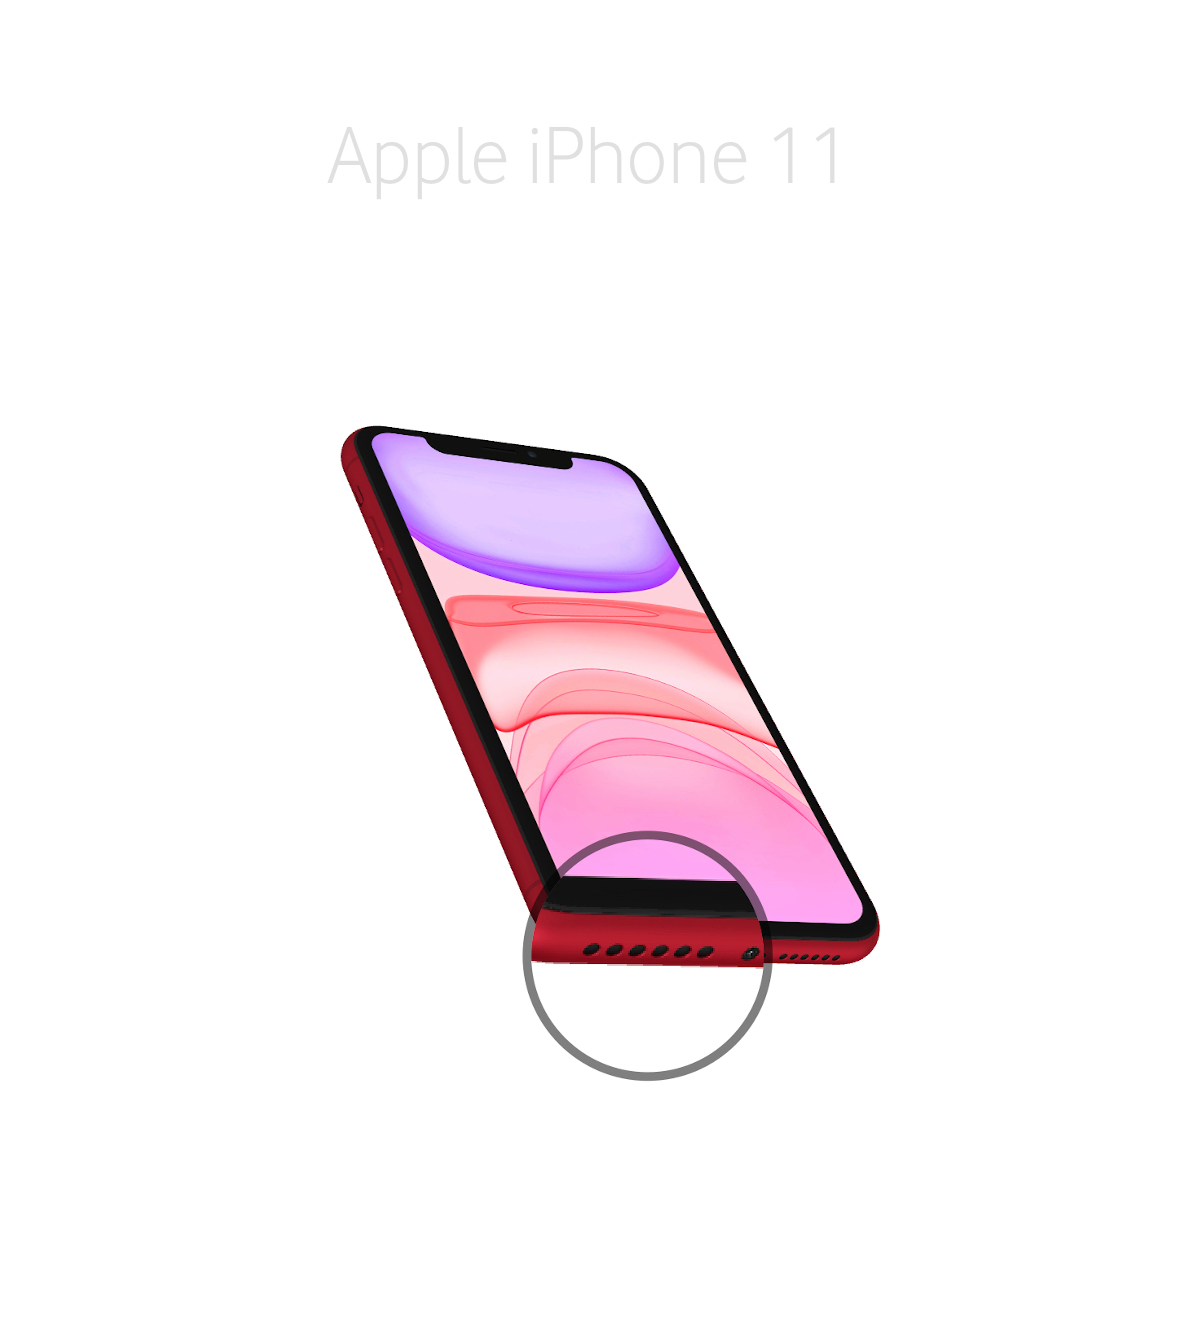 Laga mikrofon iPhone 11